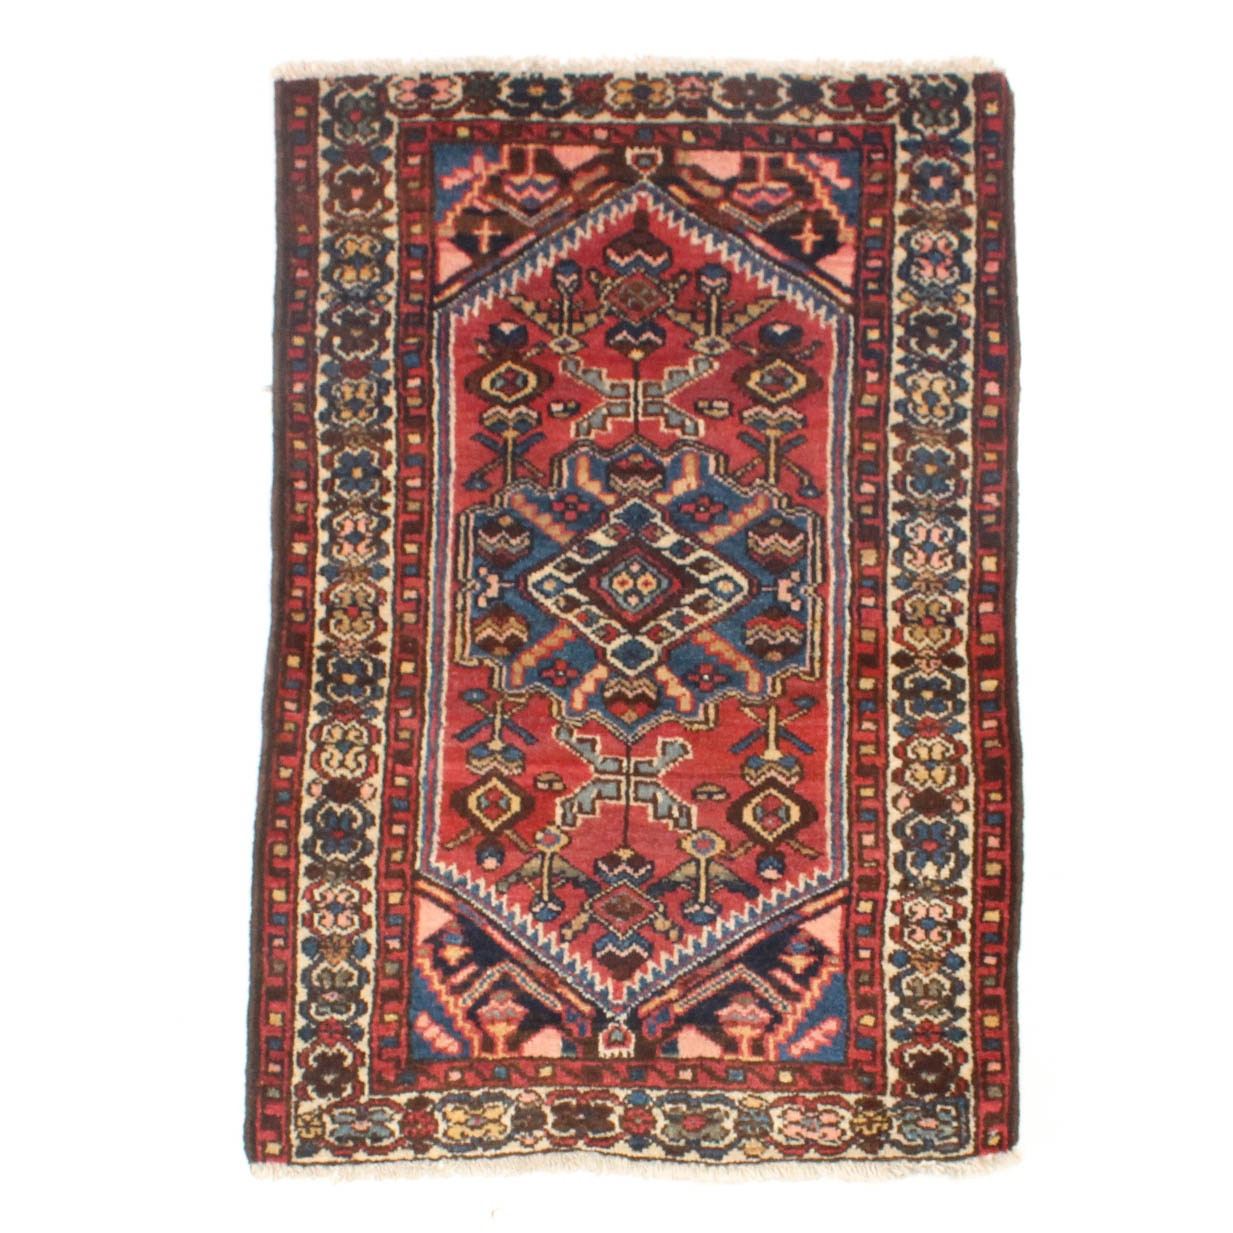 2' x 3' Semi-Antique Hand-Knotted Persian Karaja Rug